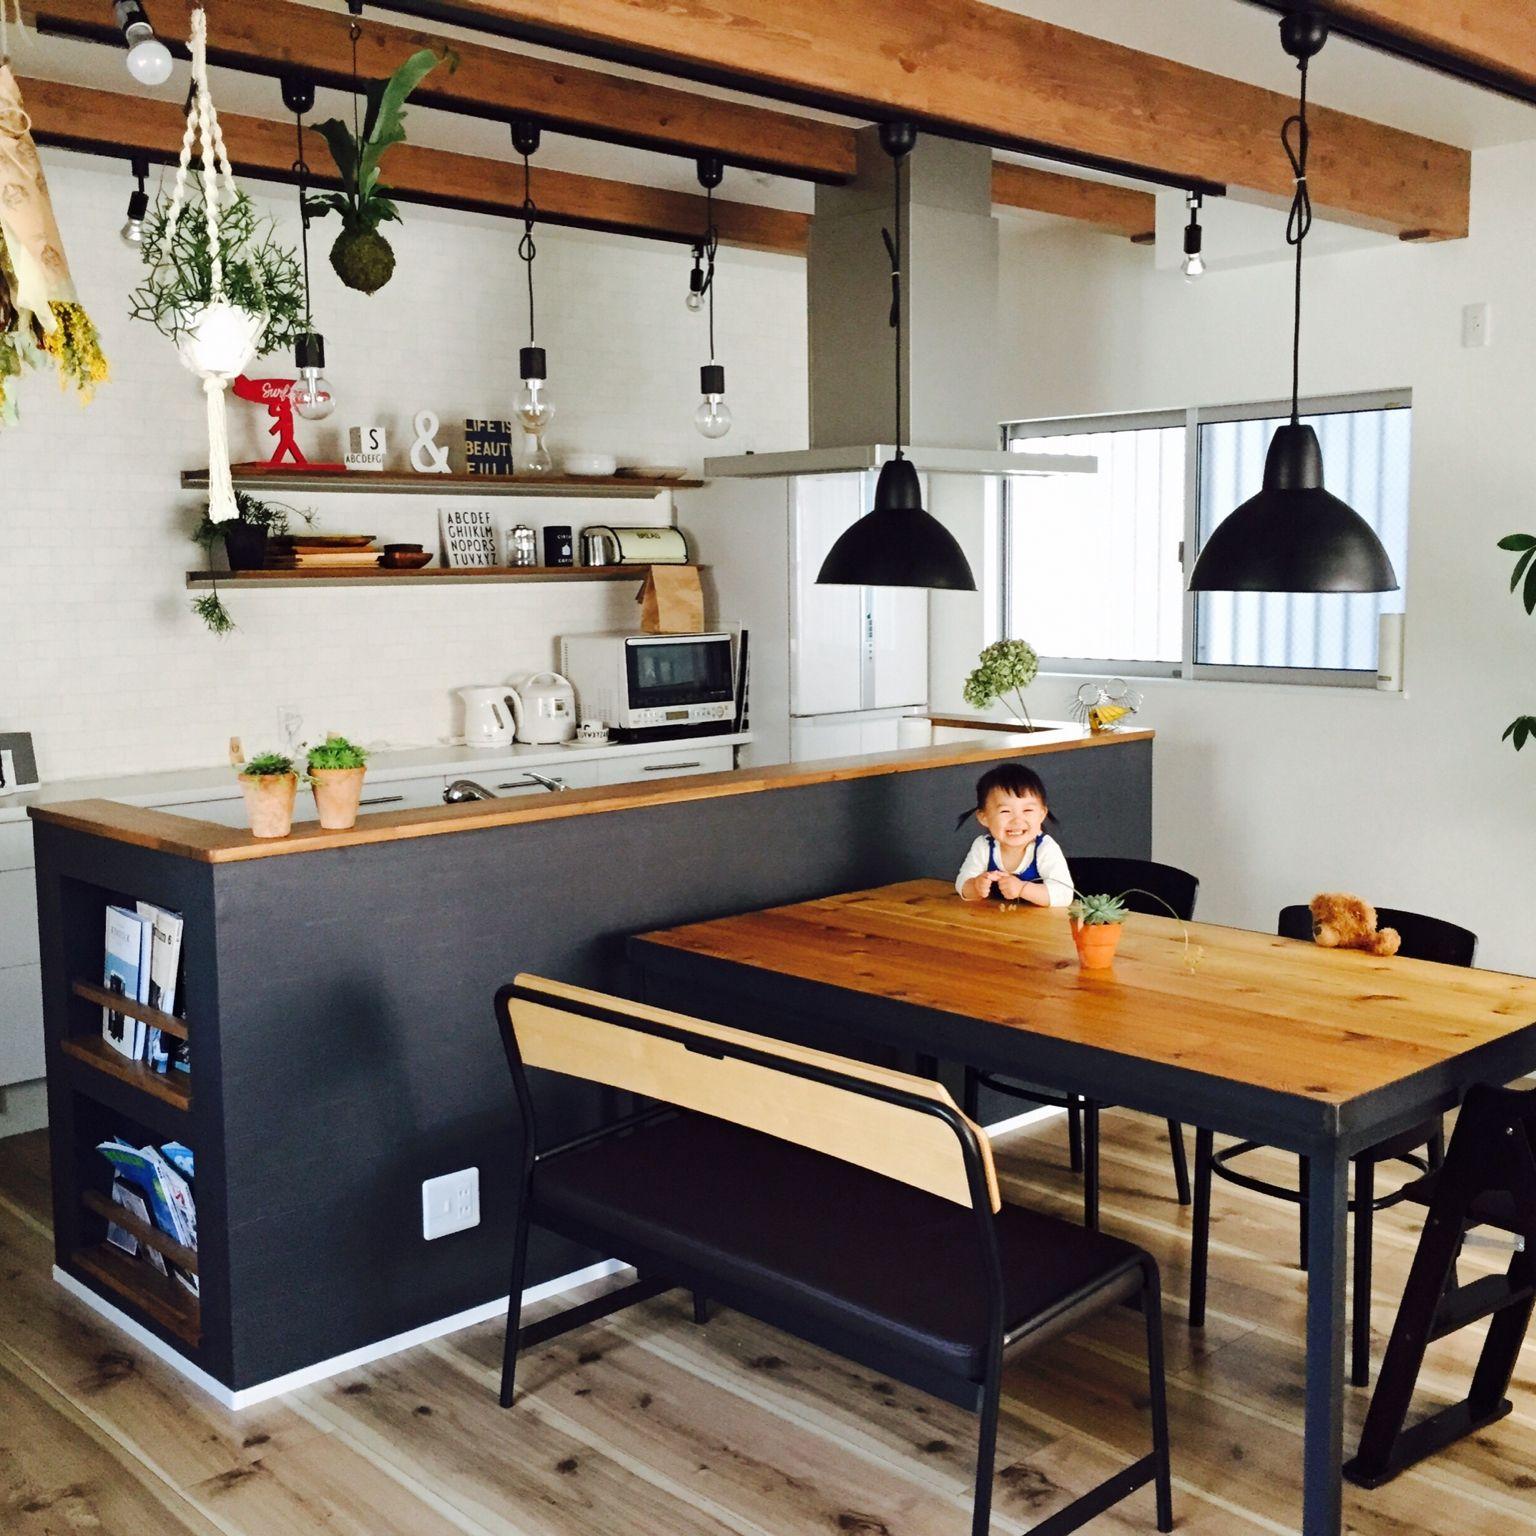 51 Small Kitchen Design Ideas That Make The Most Of A Tiny: キッチン/unico/多肉植物/雑貨/ドライフラワー...などのインテリア実例